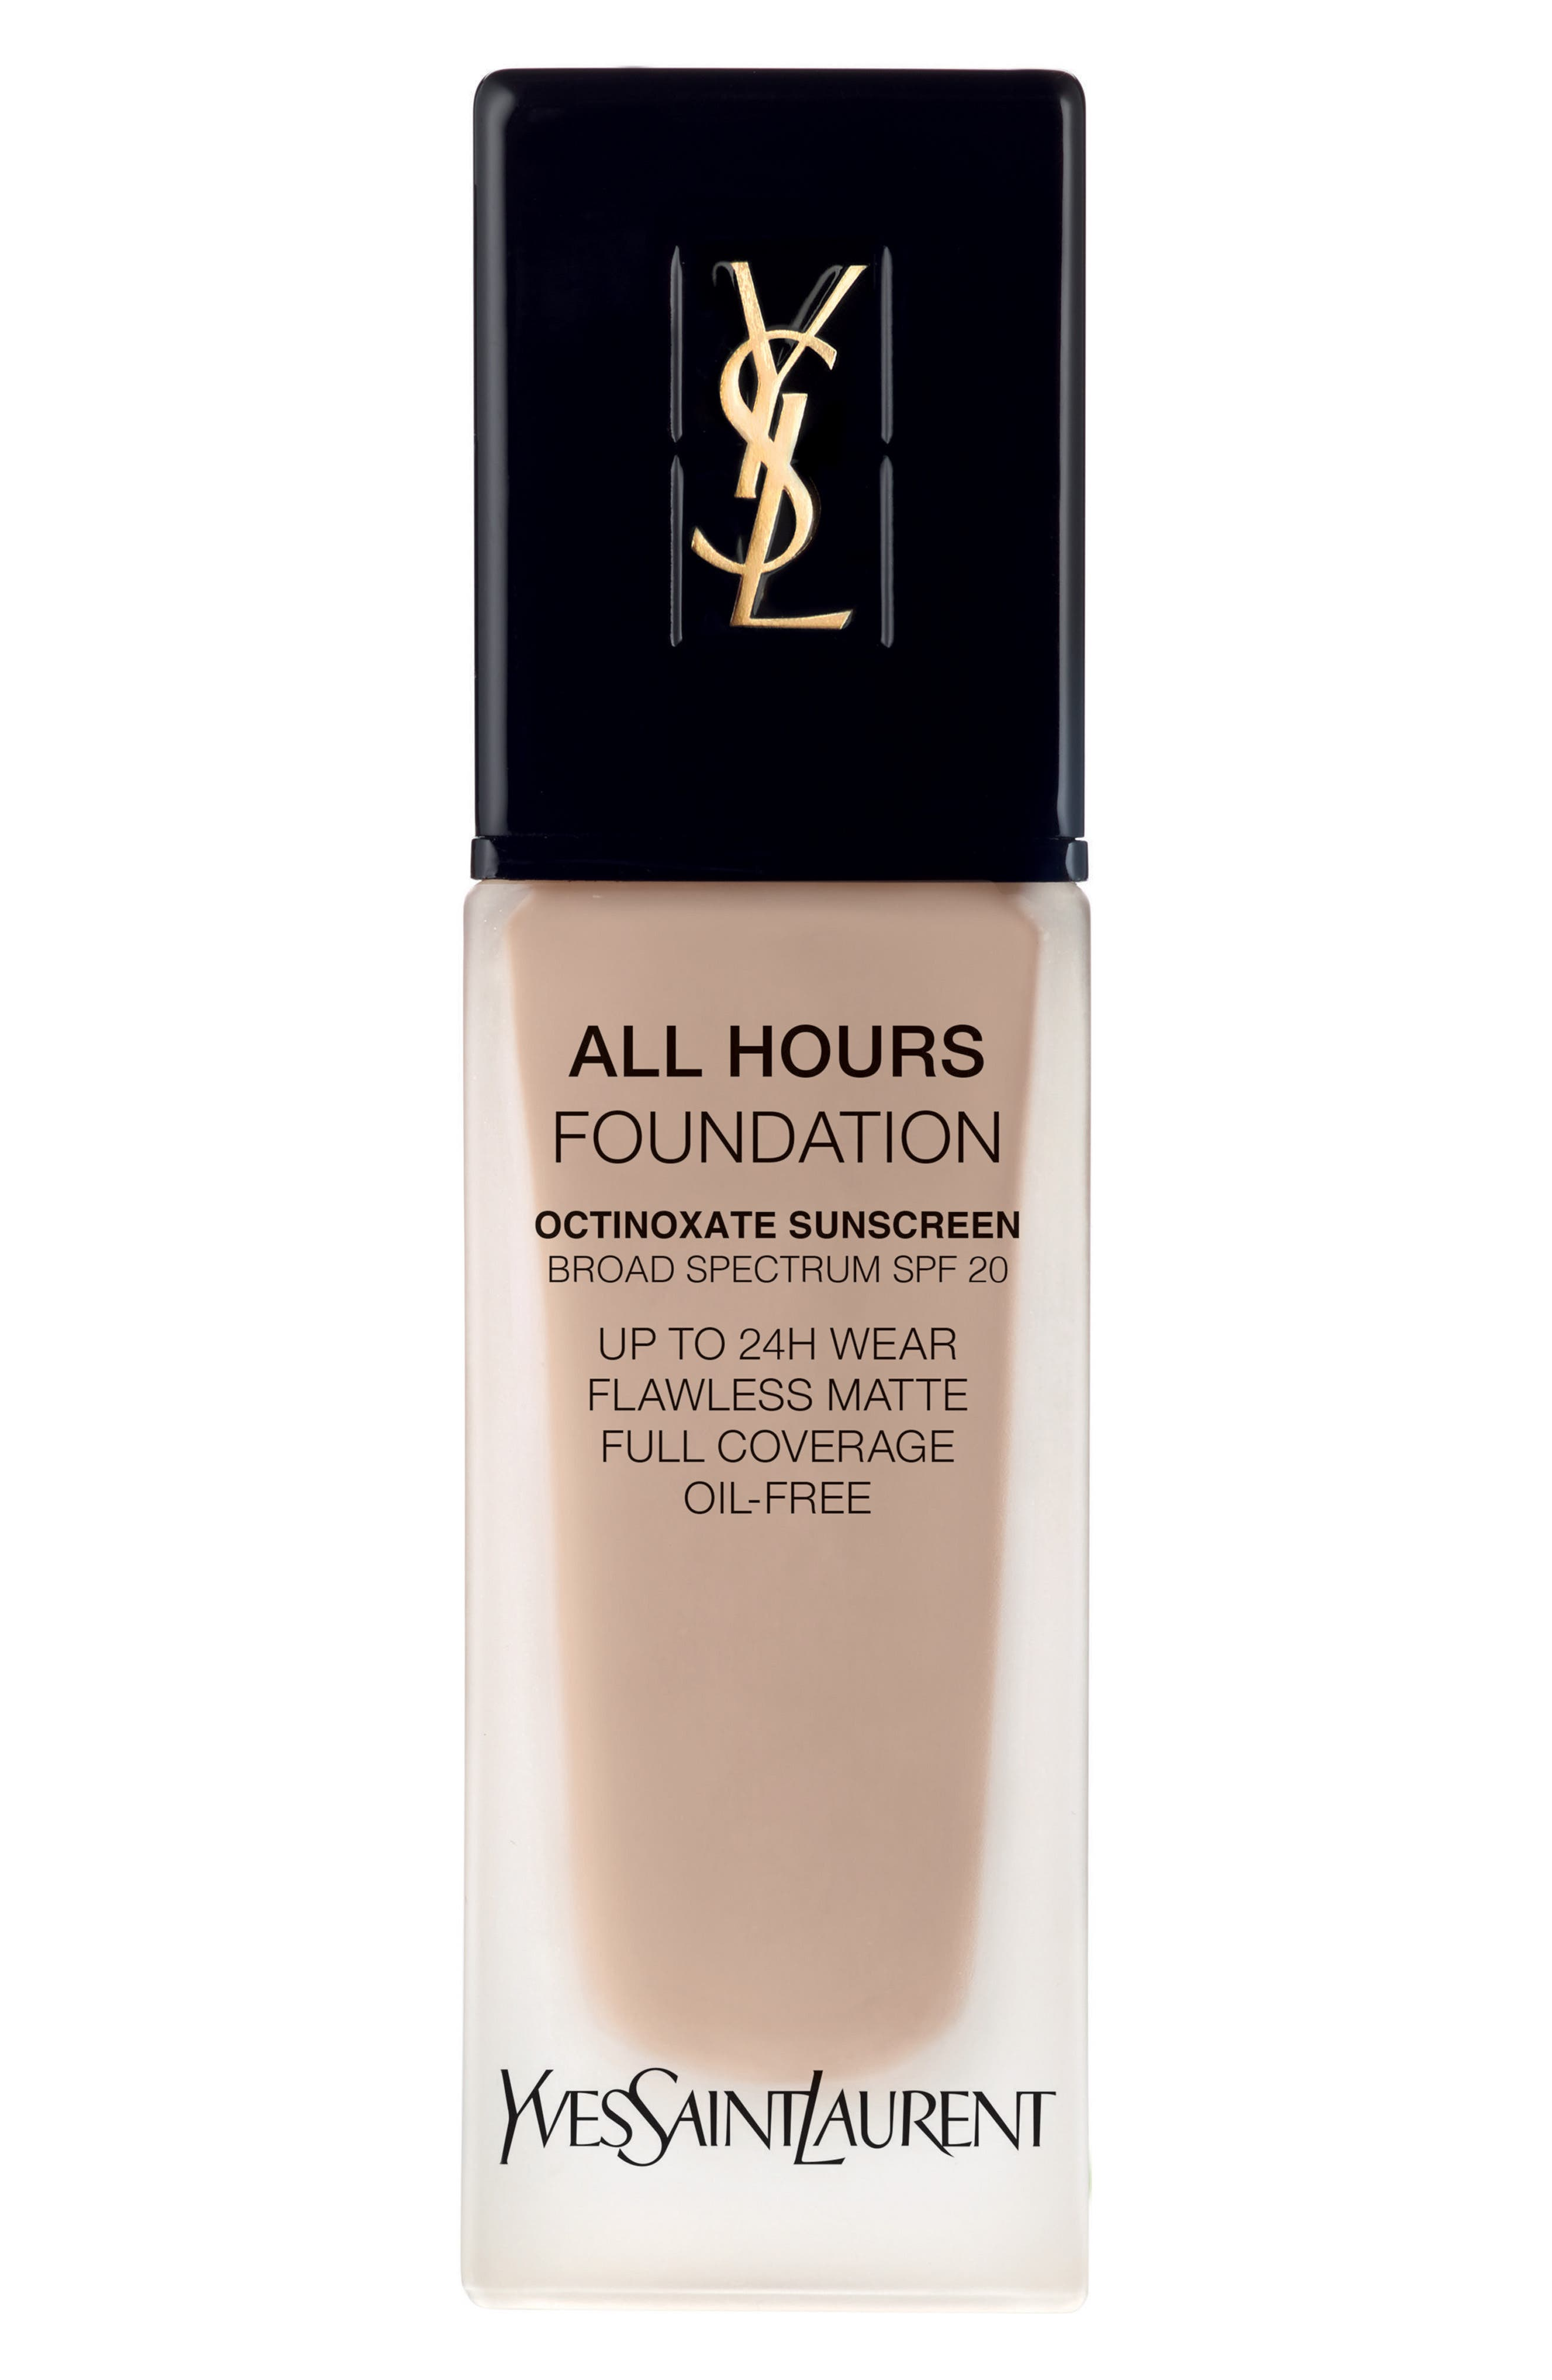 Yves Saint Laurent All Hours Full Coverage Matte Foundation Spf 20 - Br30 Cool Almond